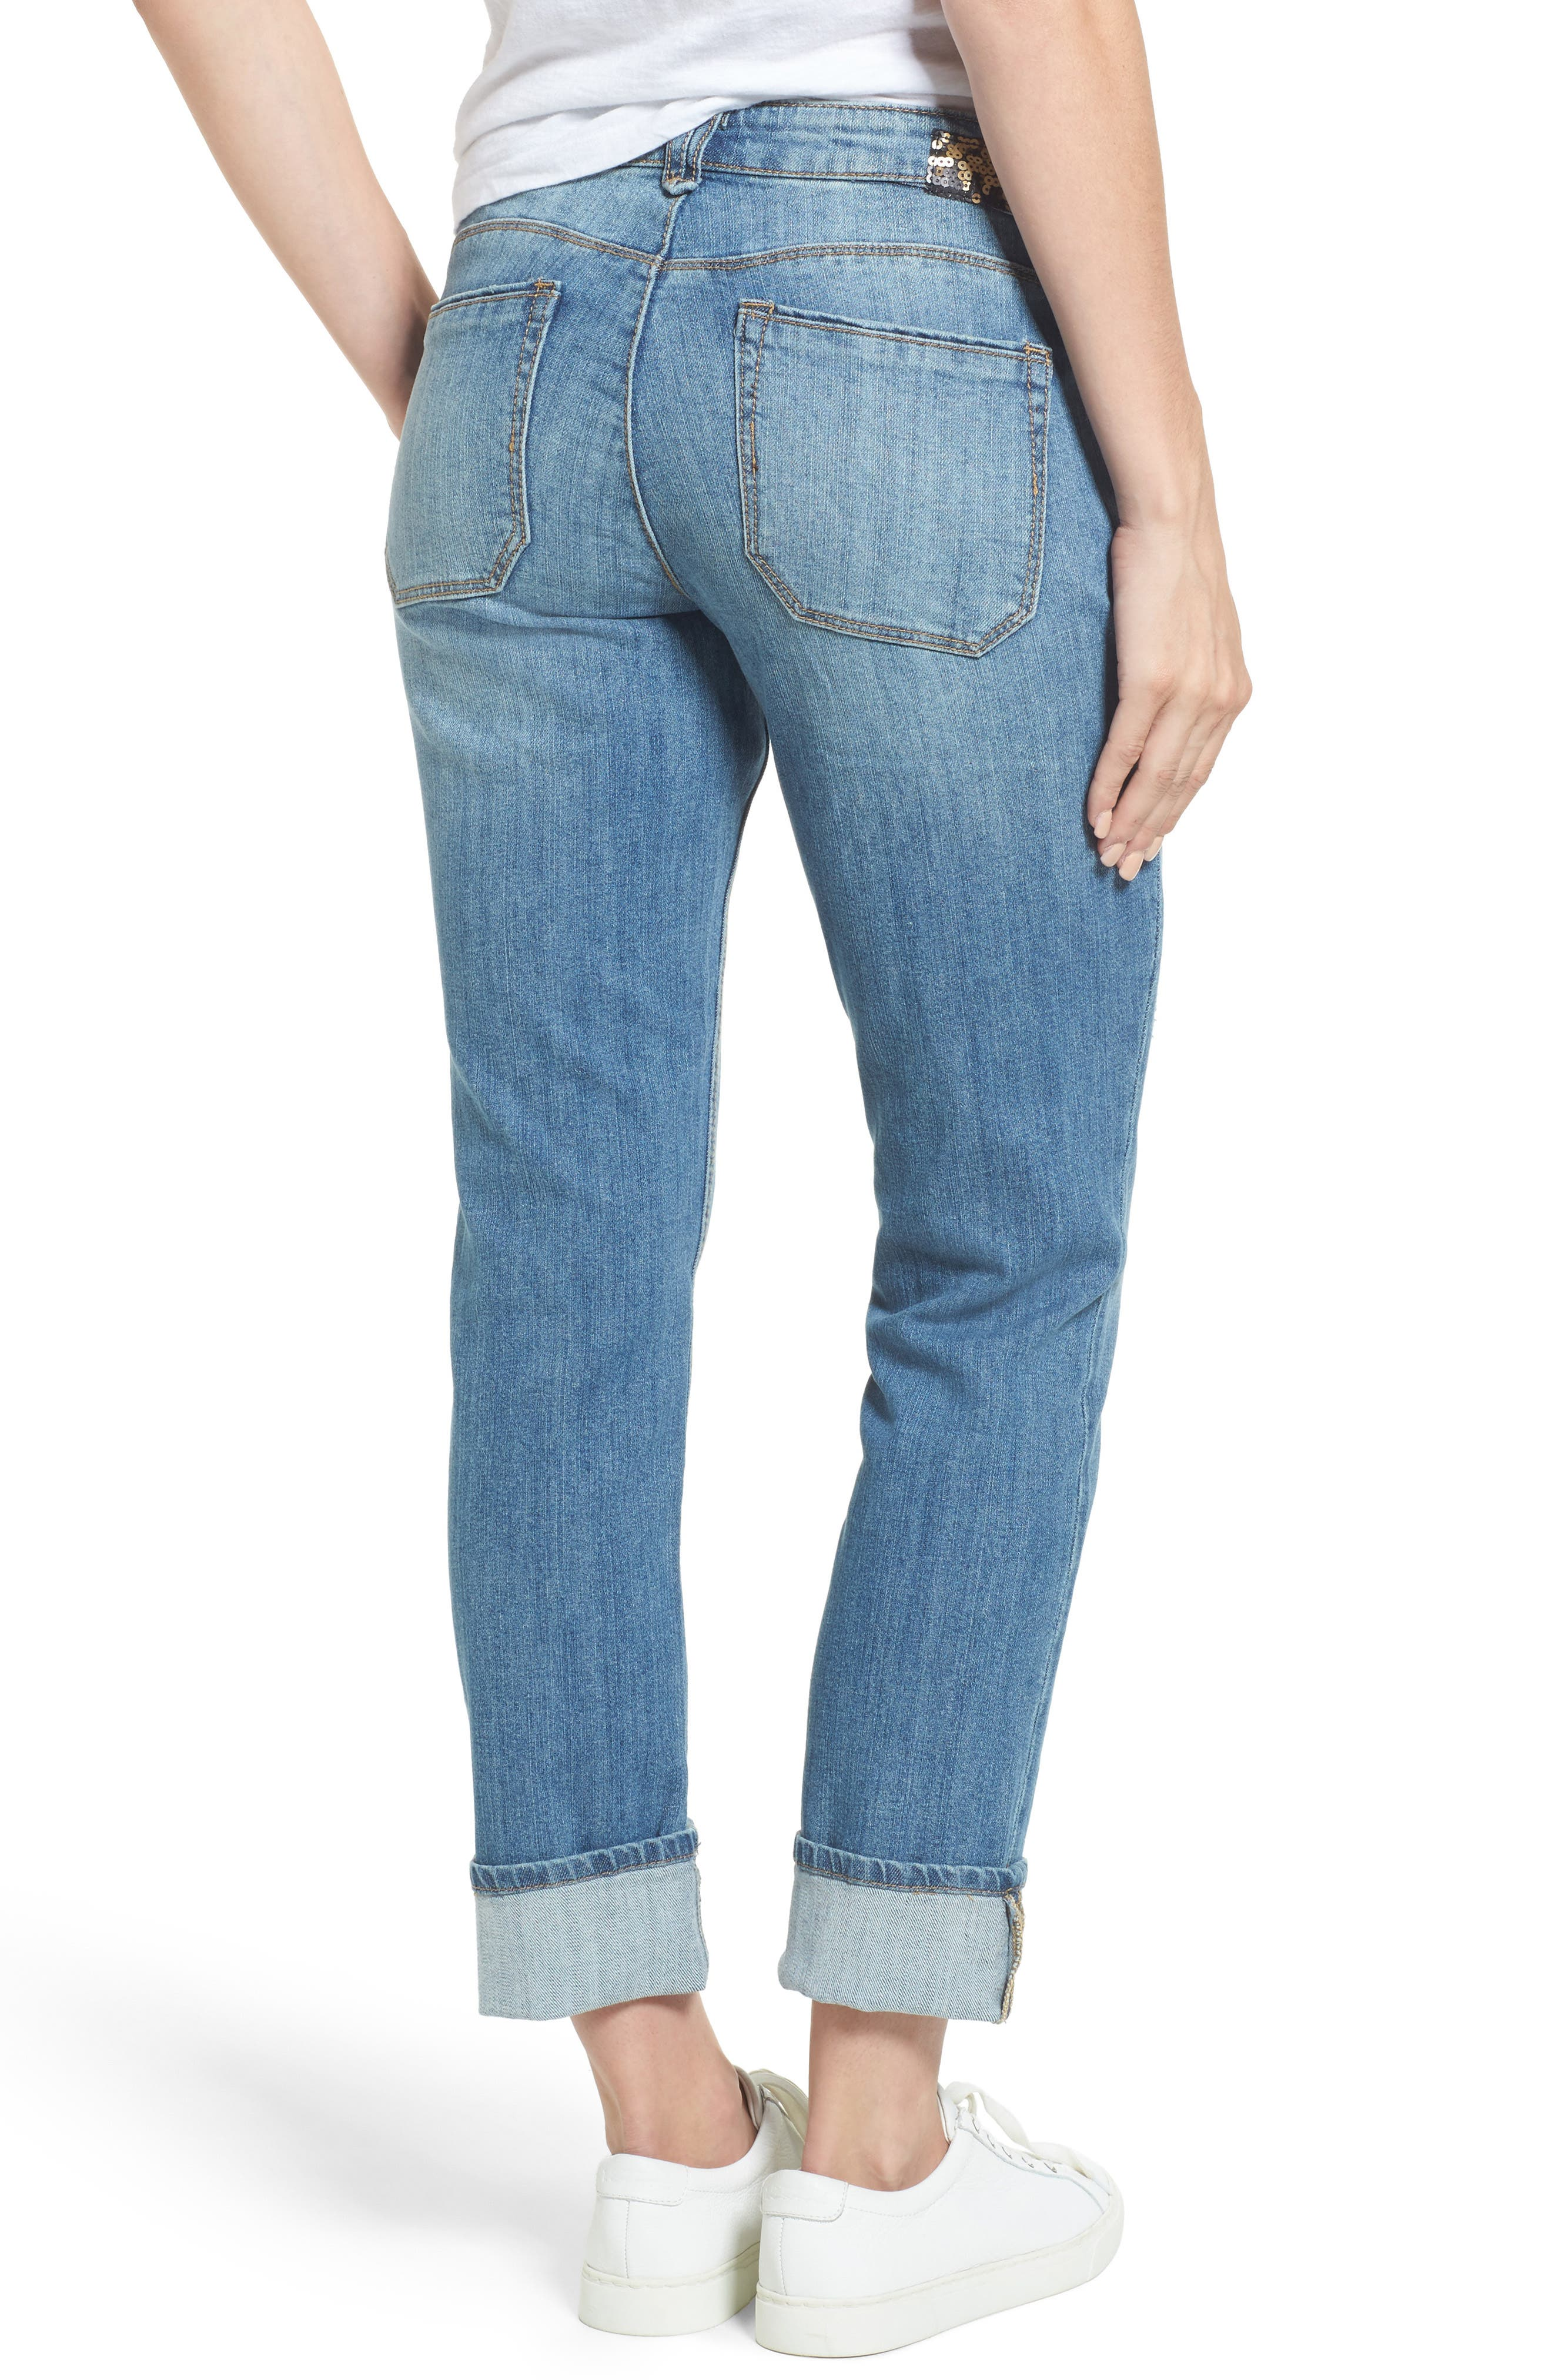 Flexellent Skinny Girlfriend Jeans,                             Alternate thumbnail 2, color,                             458